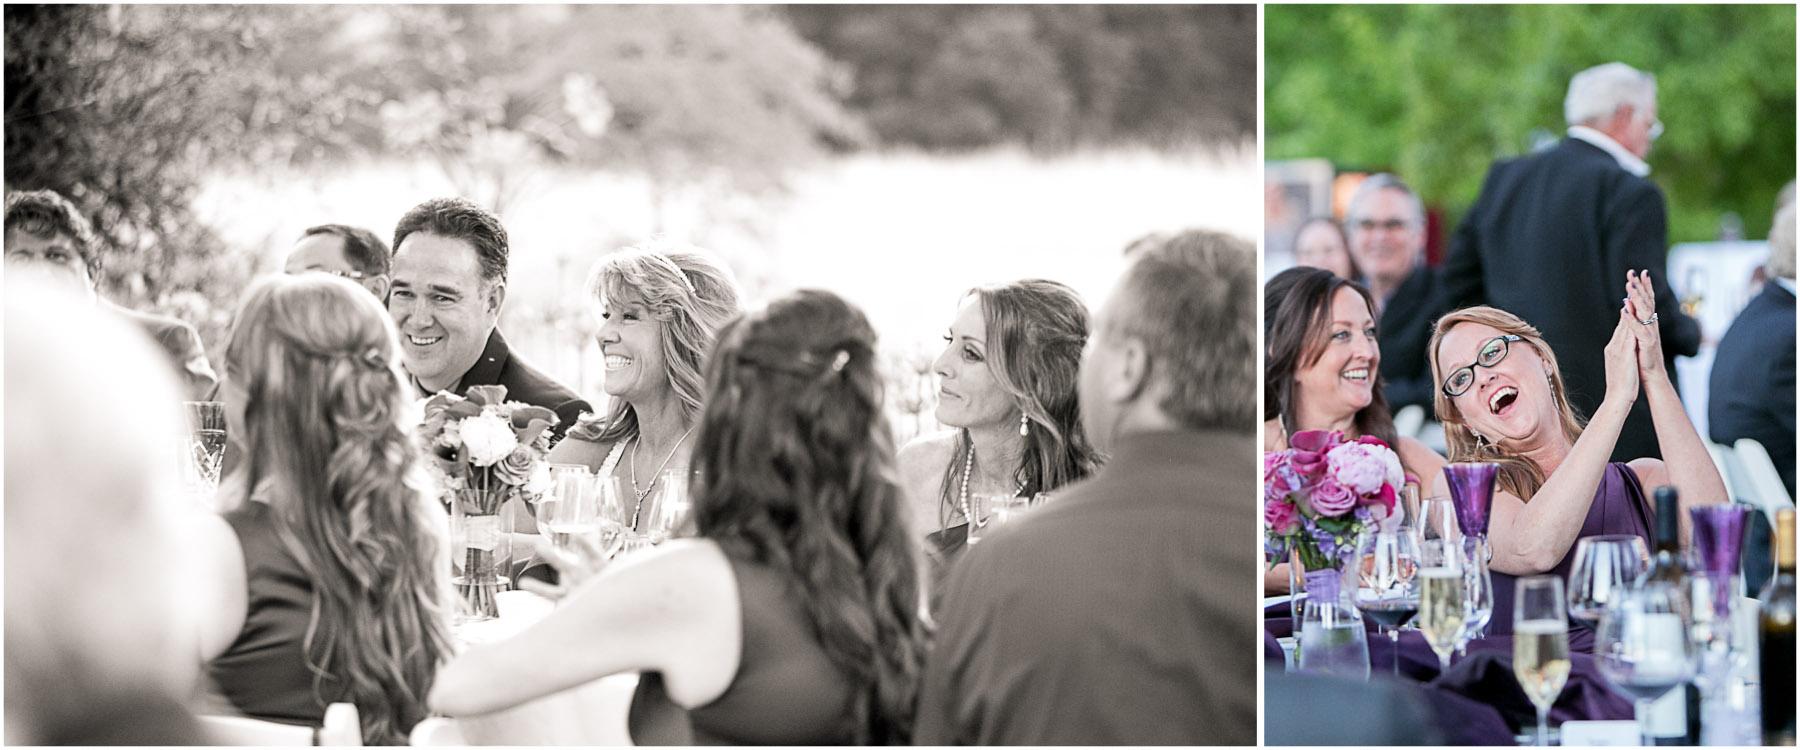 JennaBethPhotography-TMWedding-22.jpg